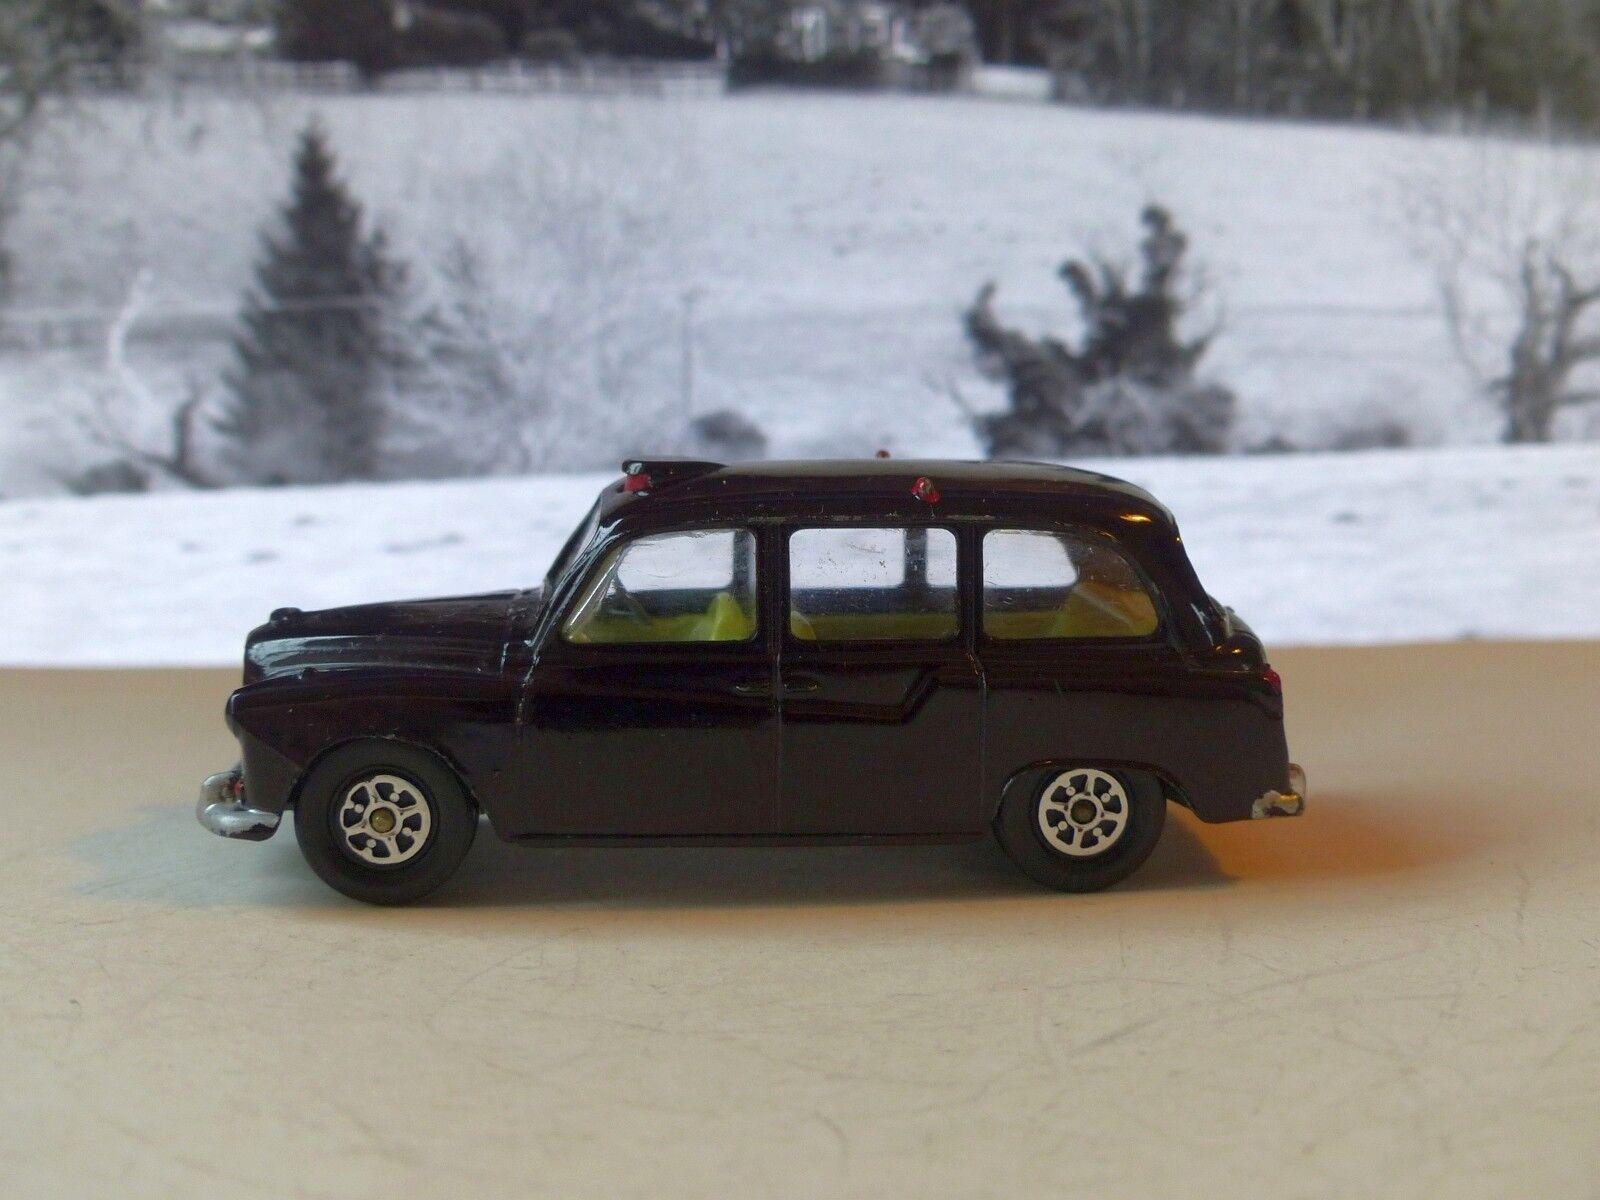 Corgi Toys 418 Austin Taxi in deep maroon with Gelb interior